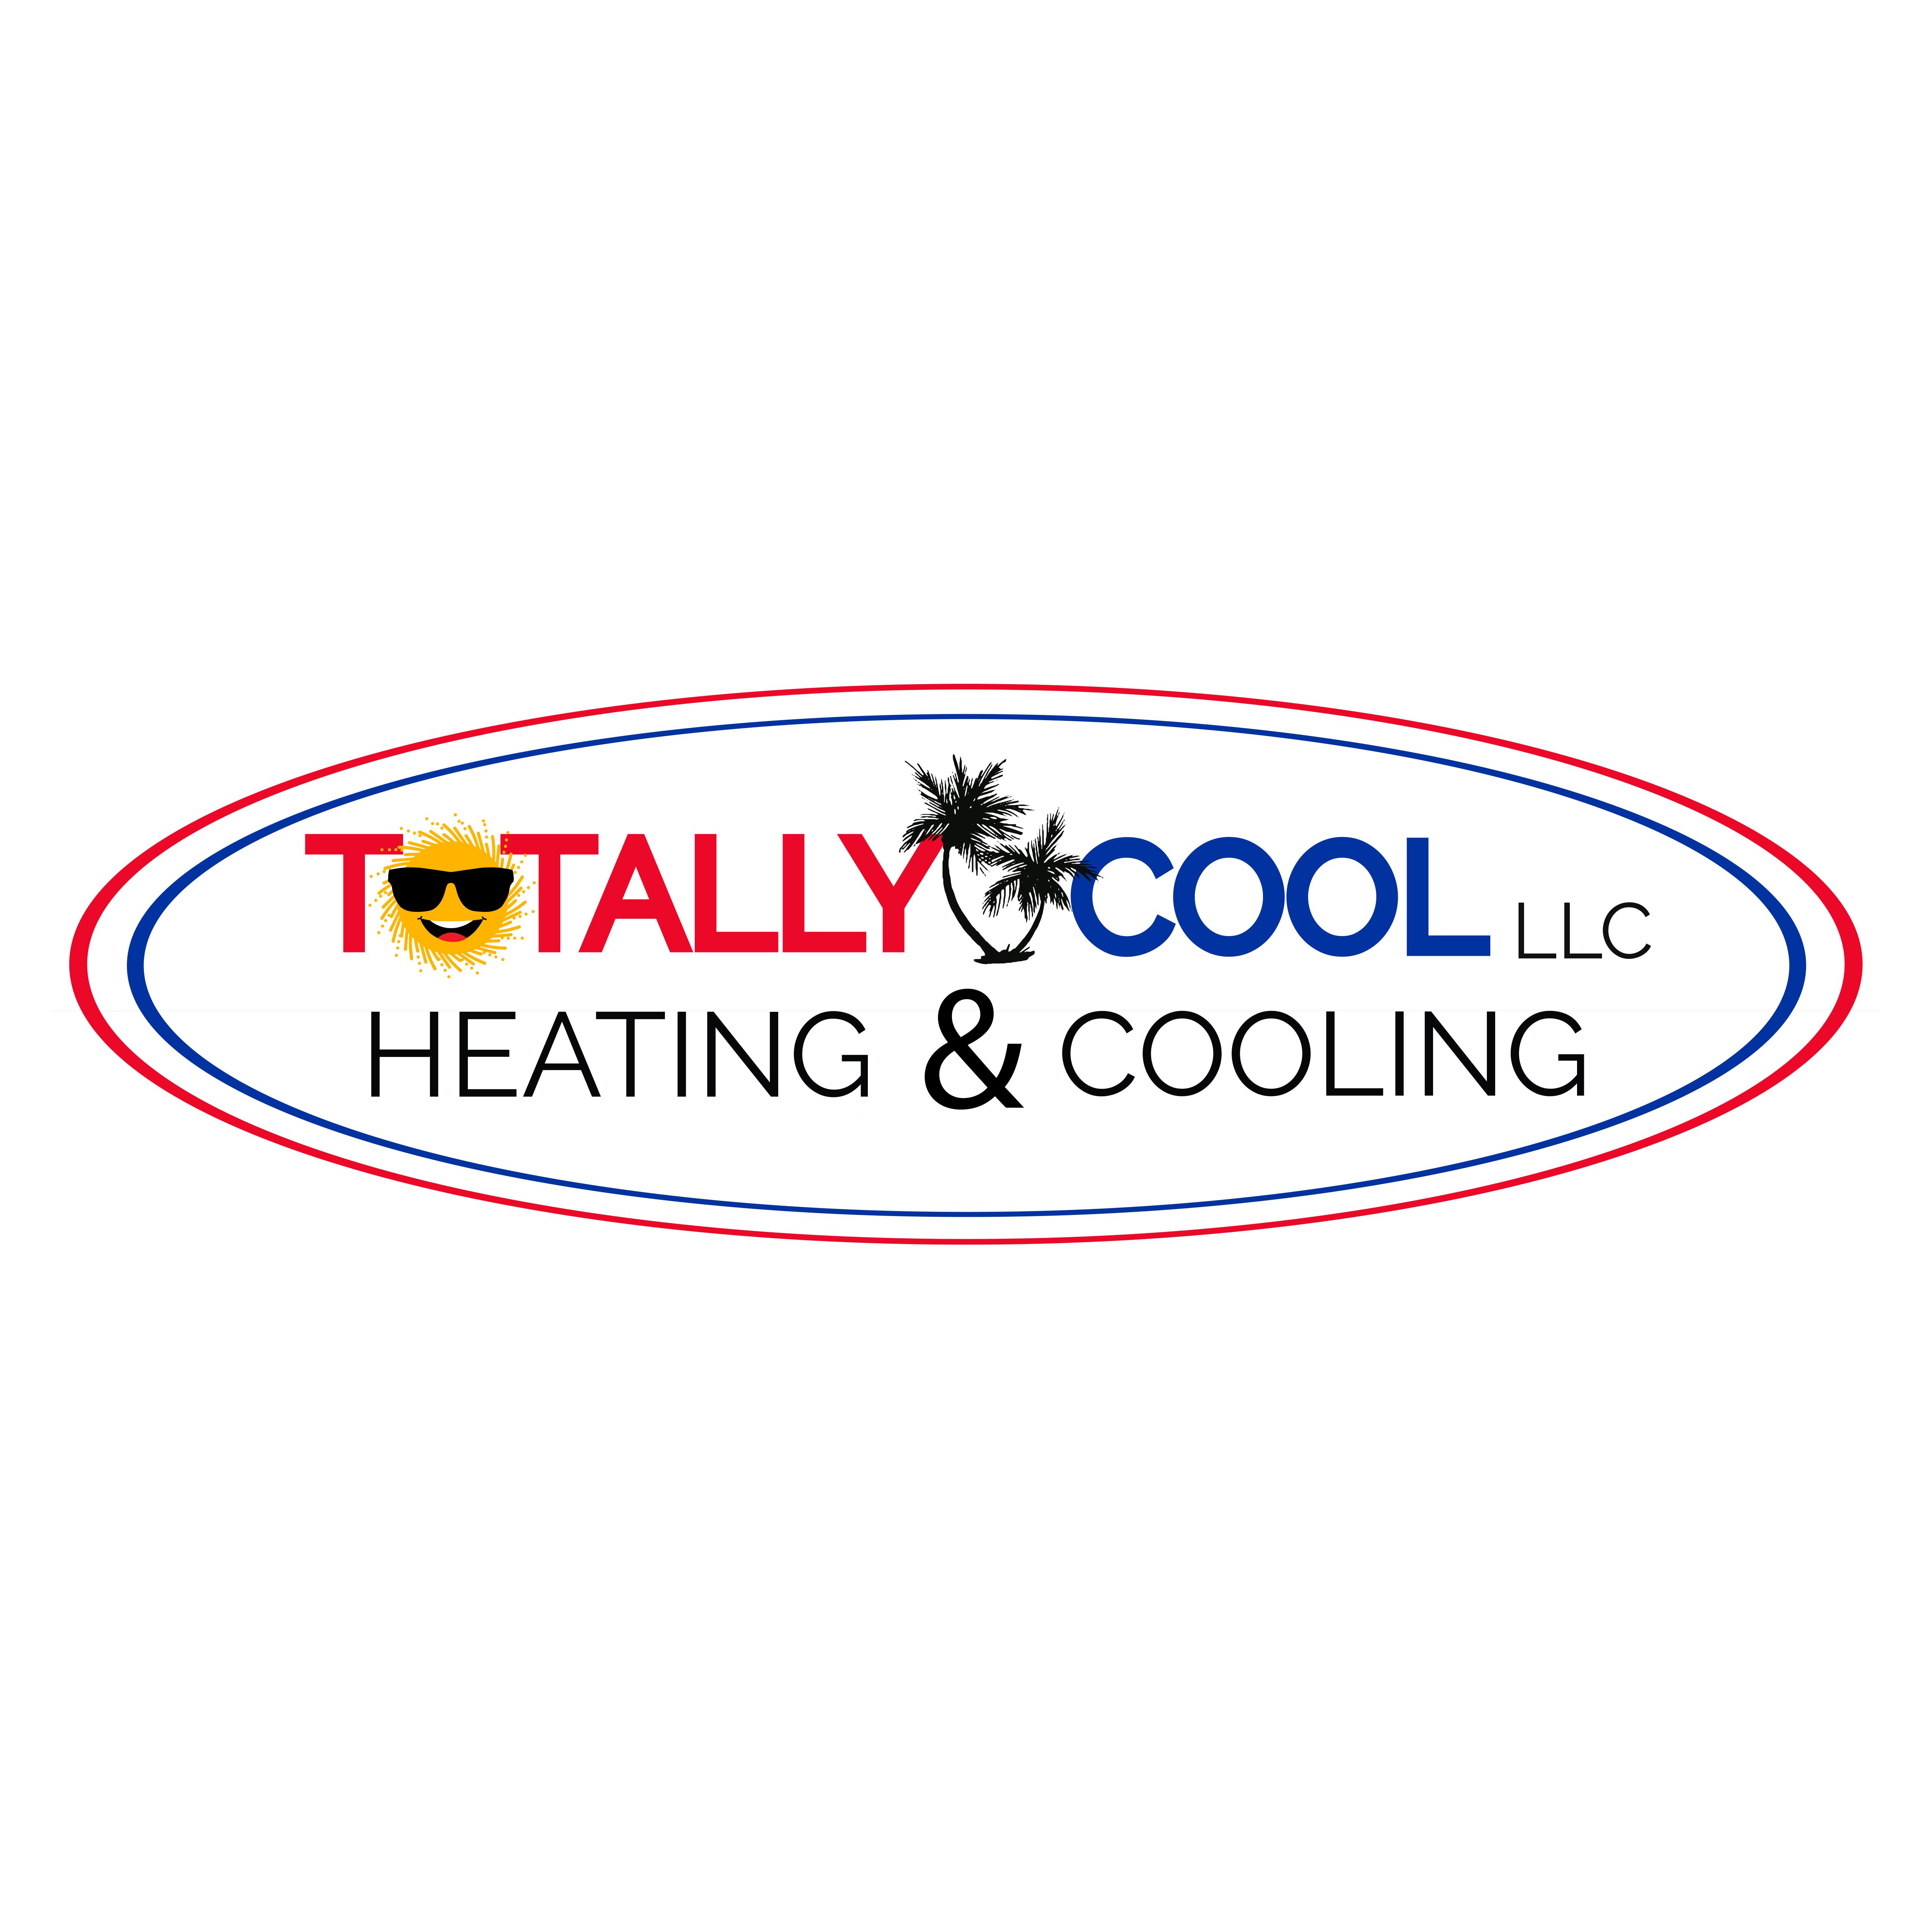 Totally Cool, LLC